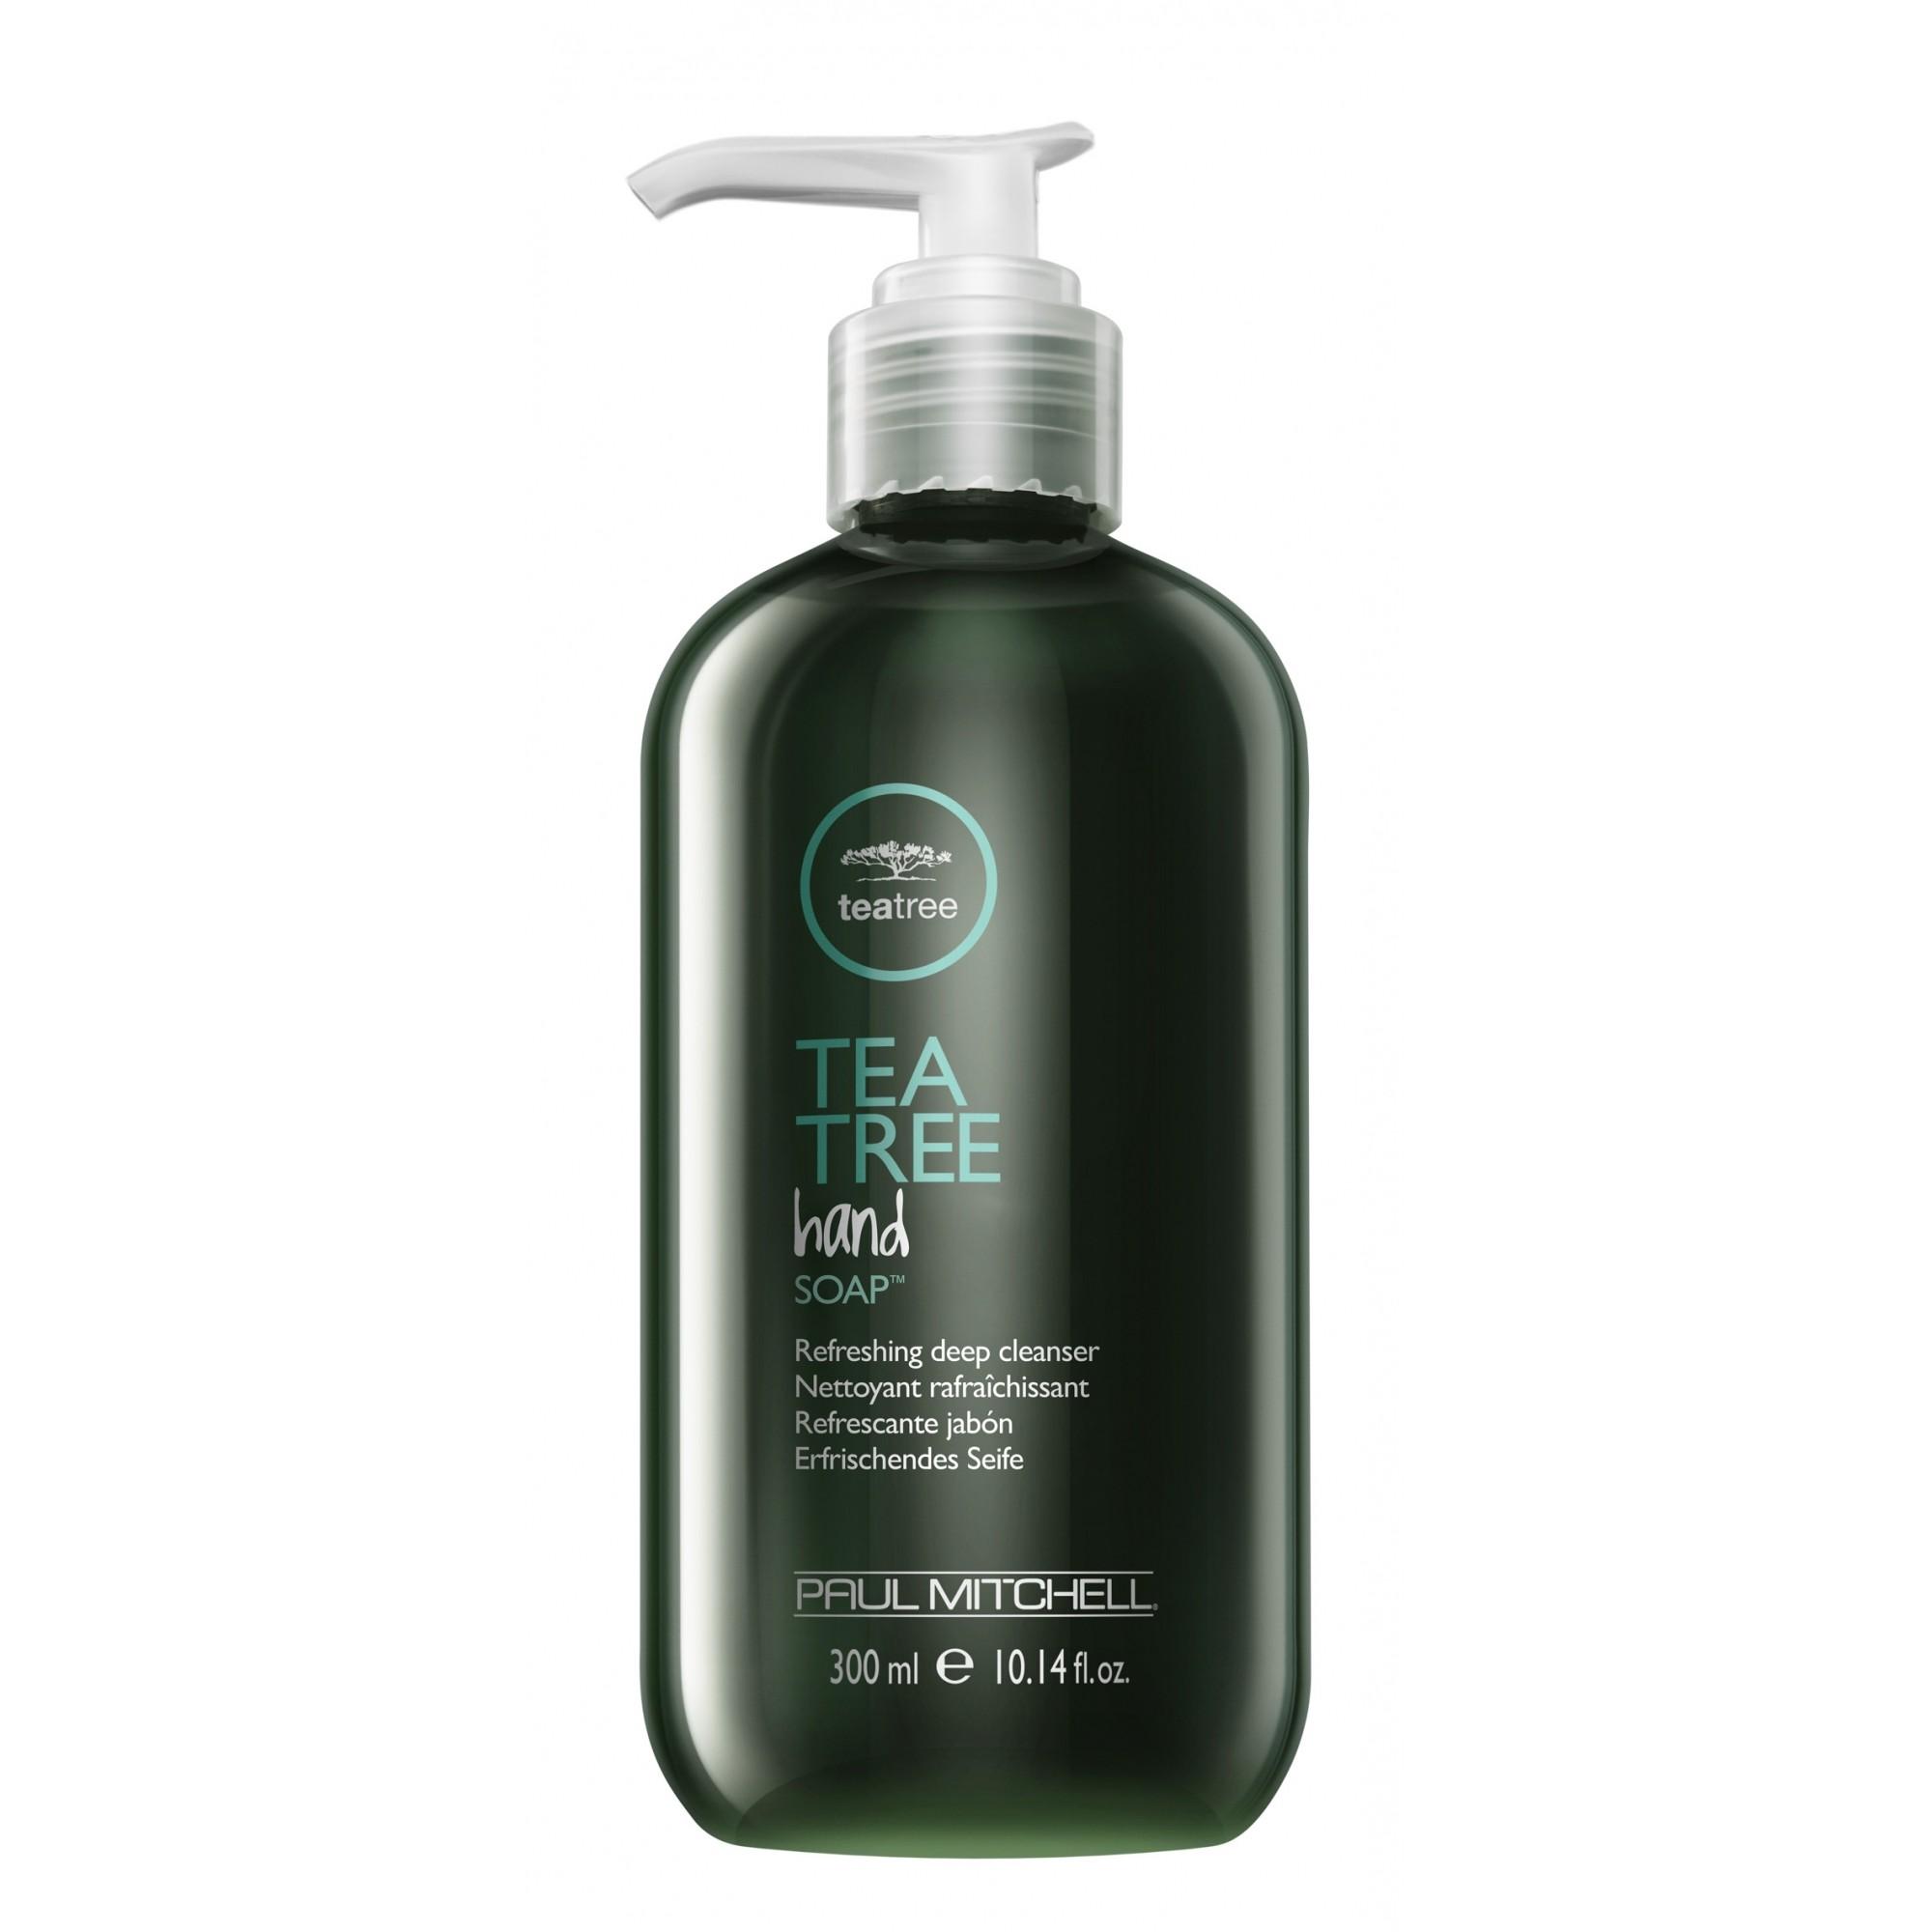 Sabonete Líquido Tea Tree Liquid Hand Soap (300ml) | PAUL MITCHELL